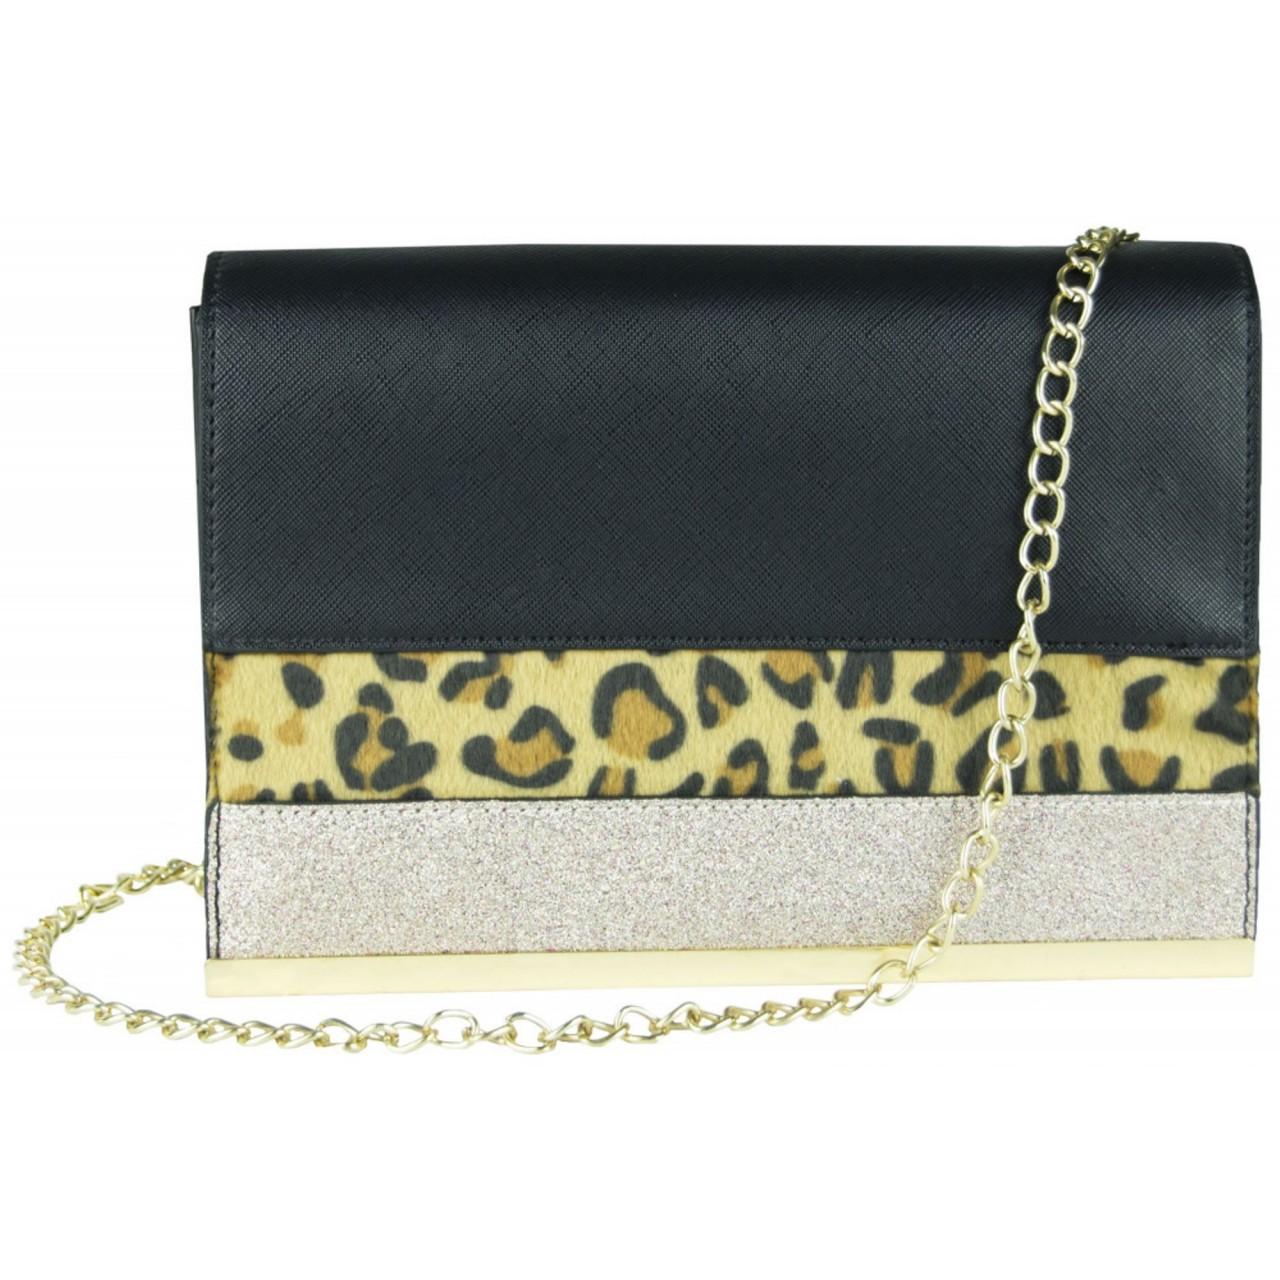 Handtasche schwarz / silber Original Dorothy Perkins